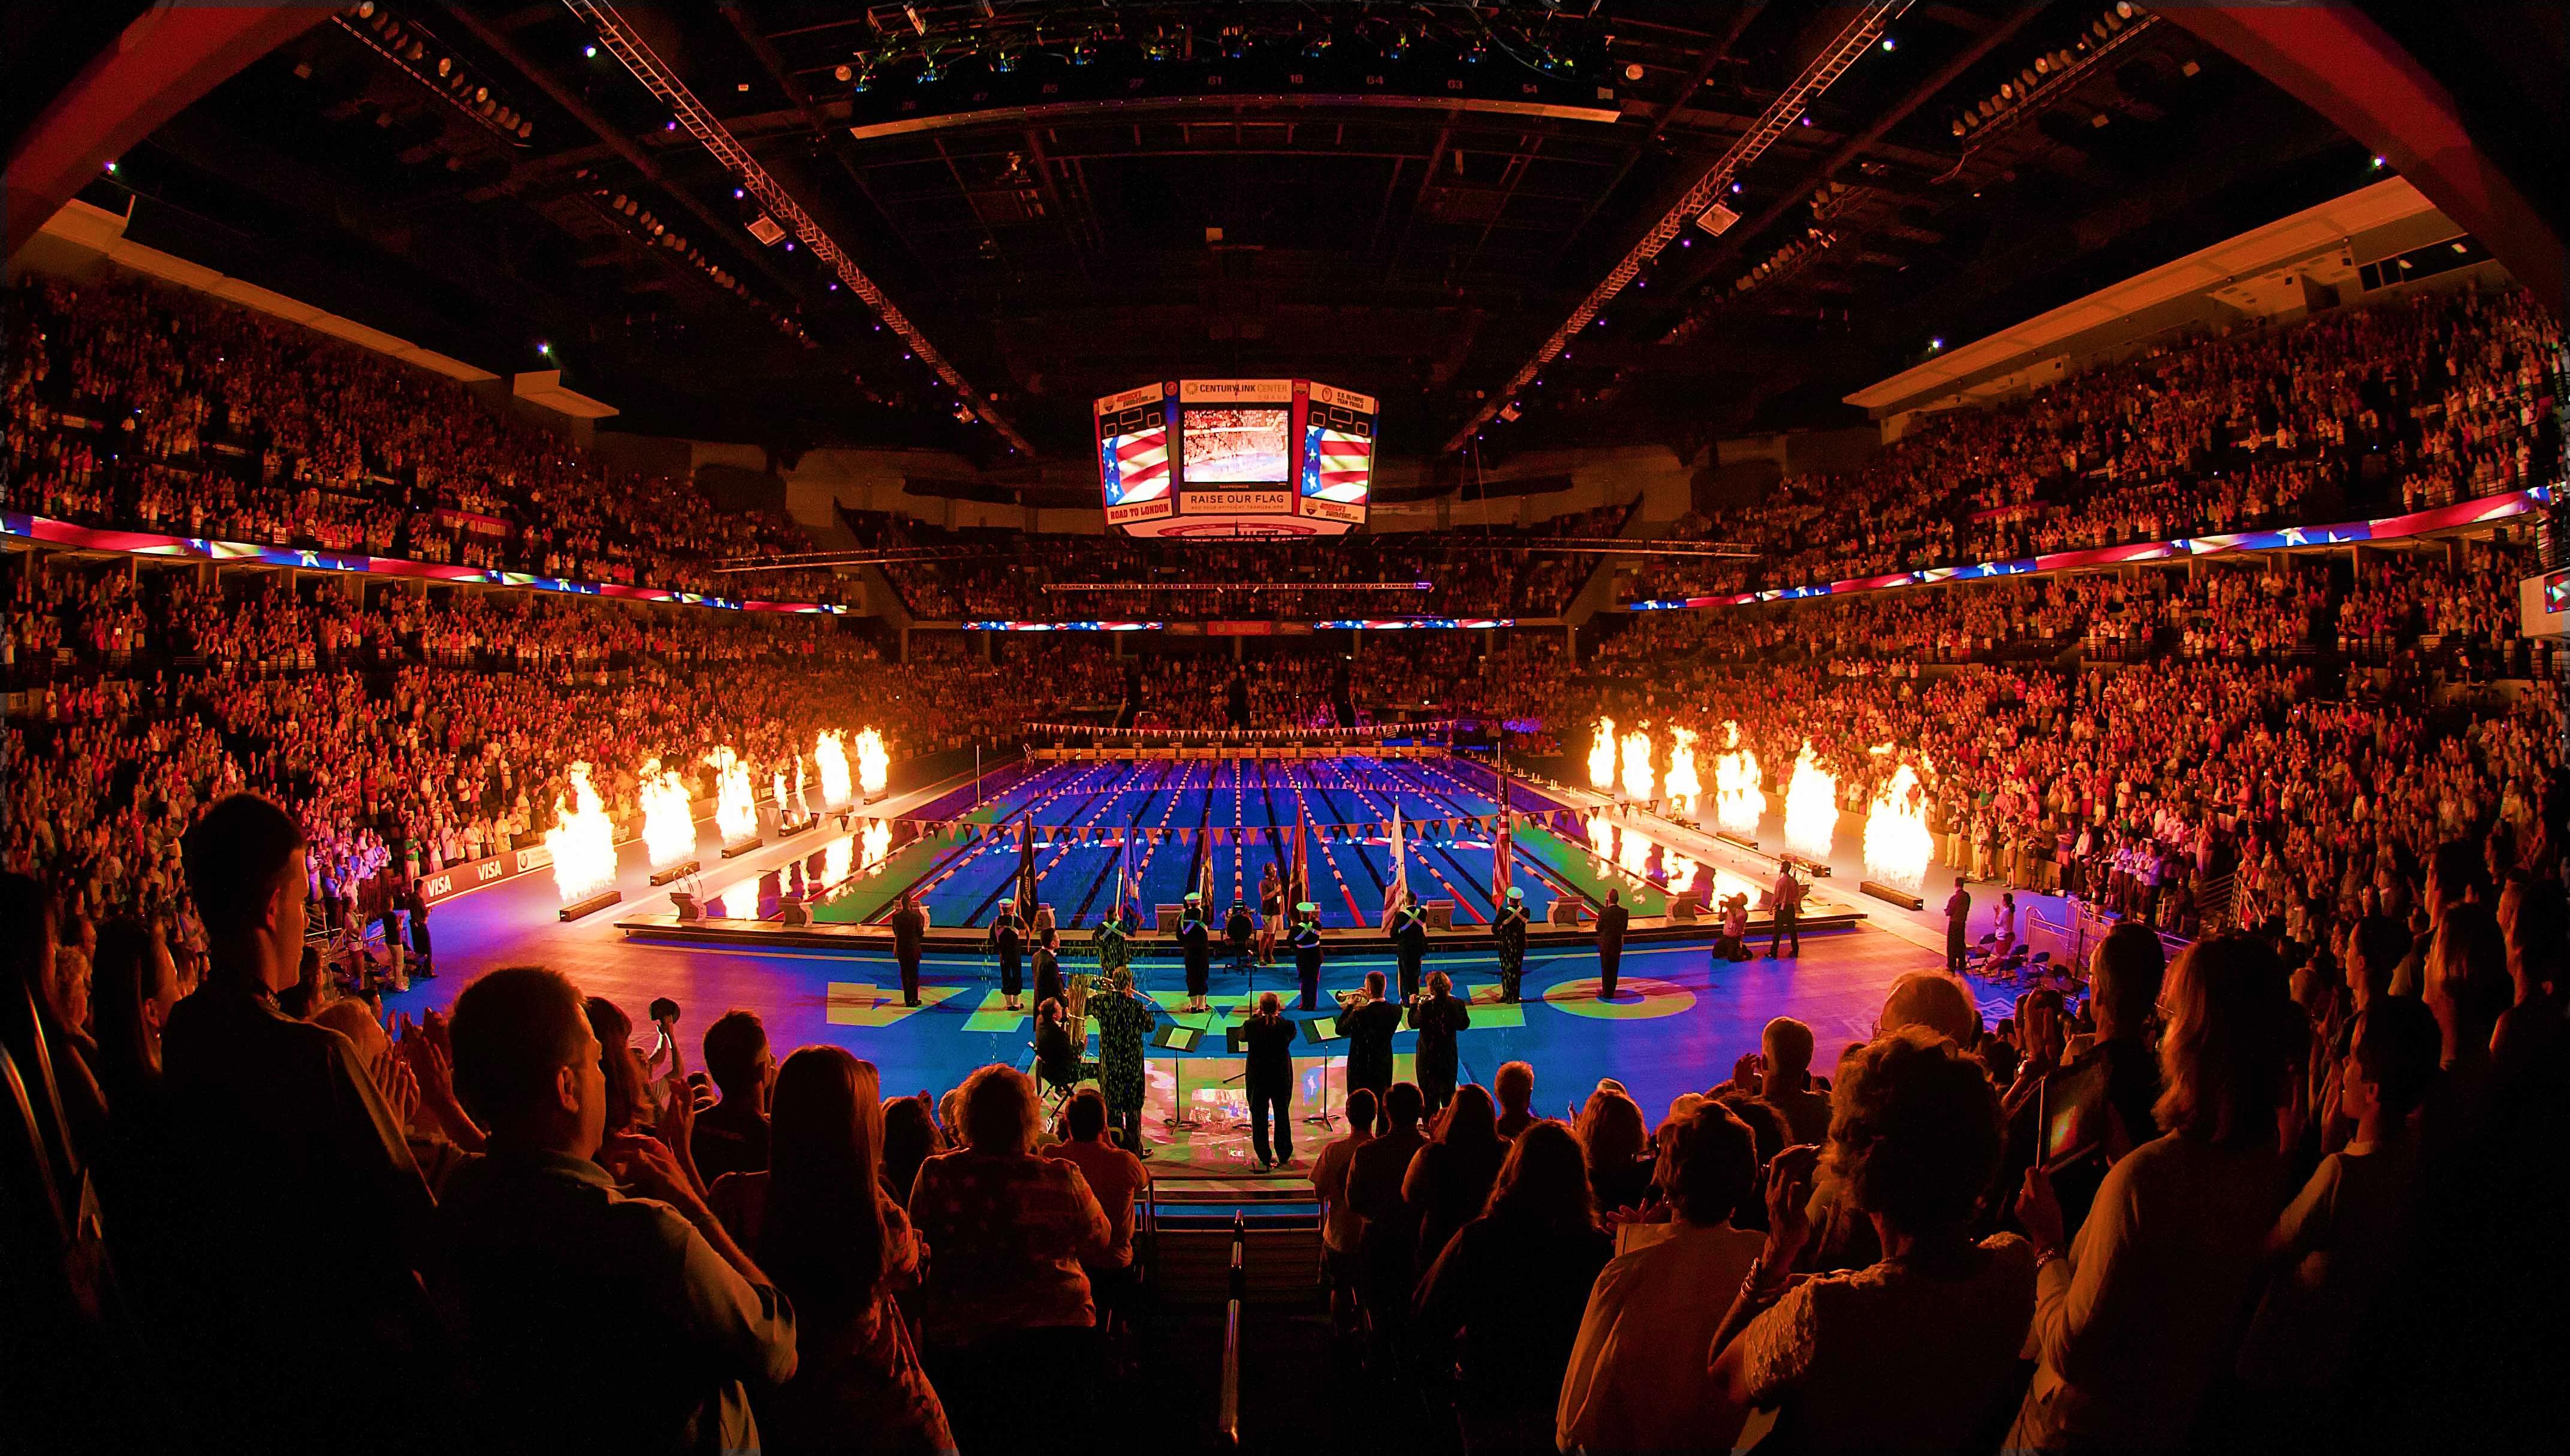 Olympics_Swim_Stadium_Filtered.jpg